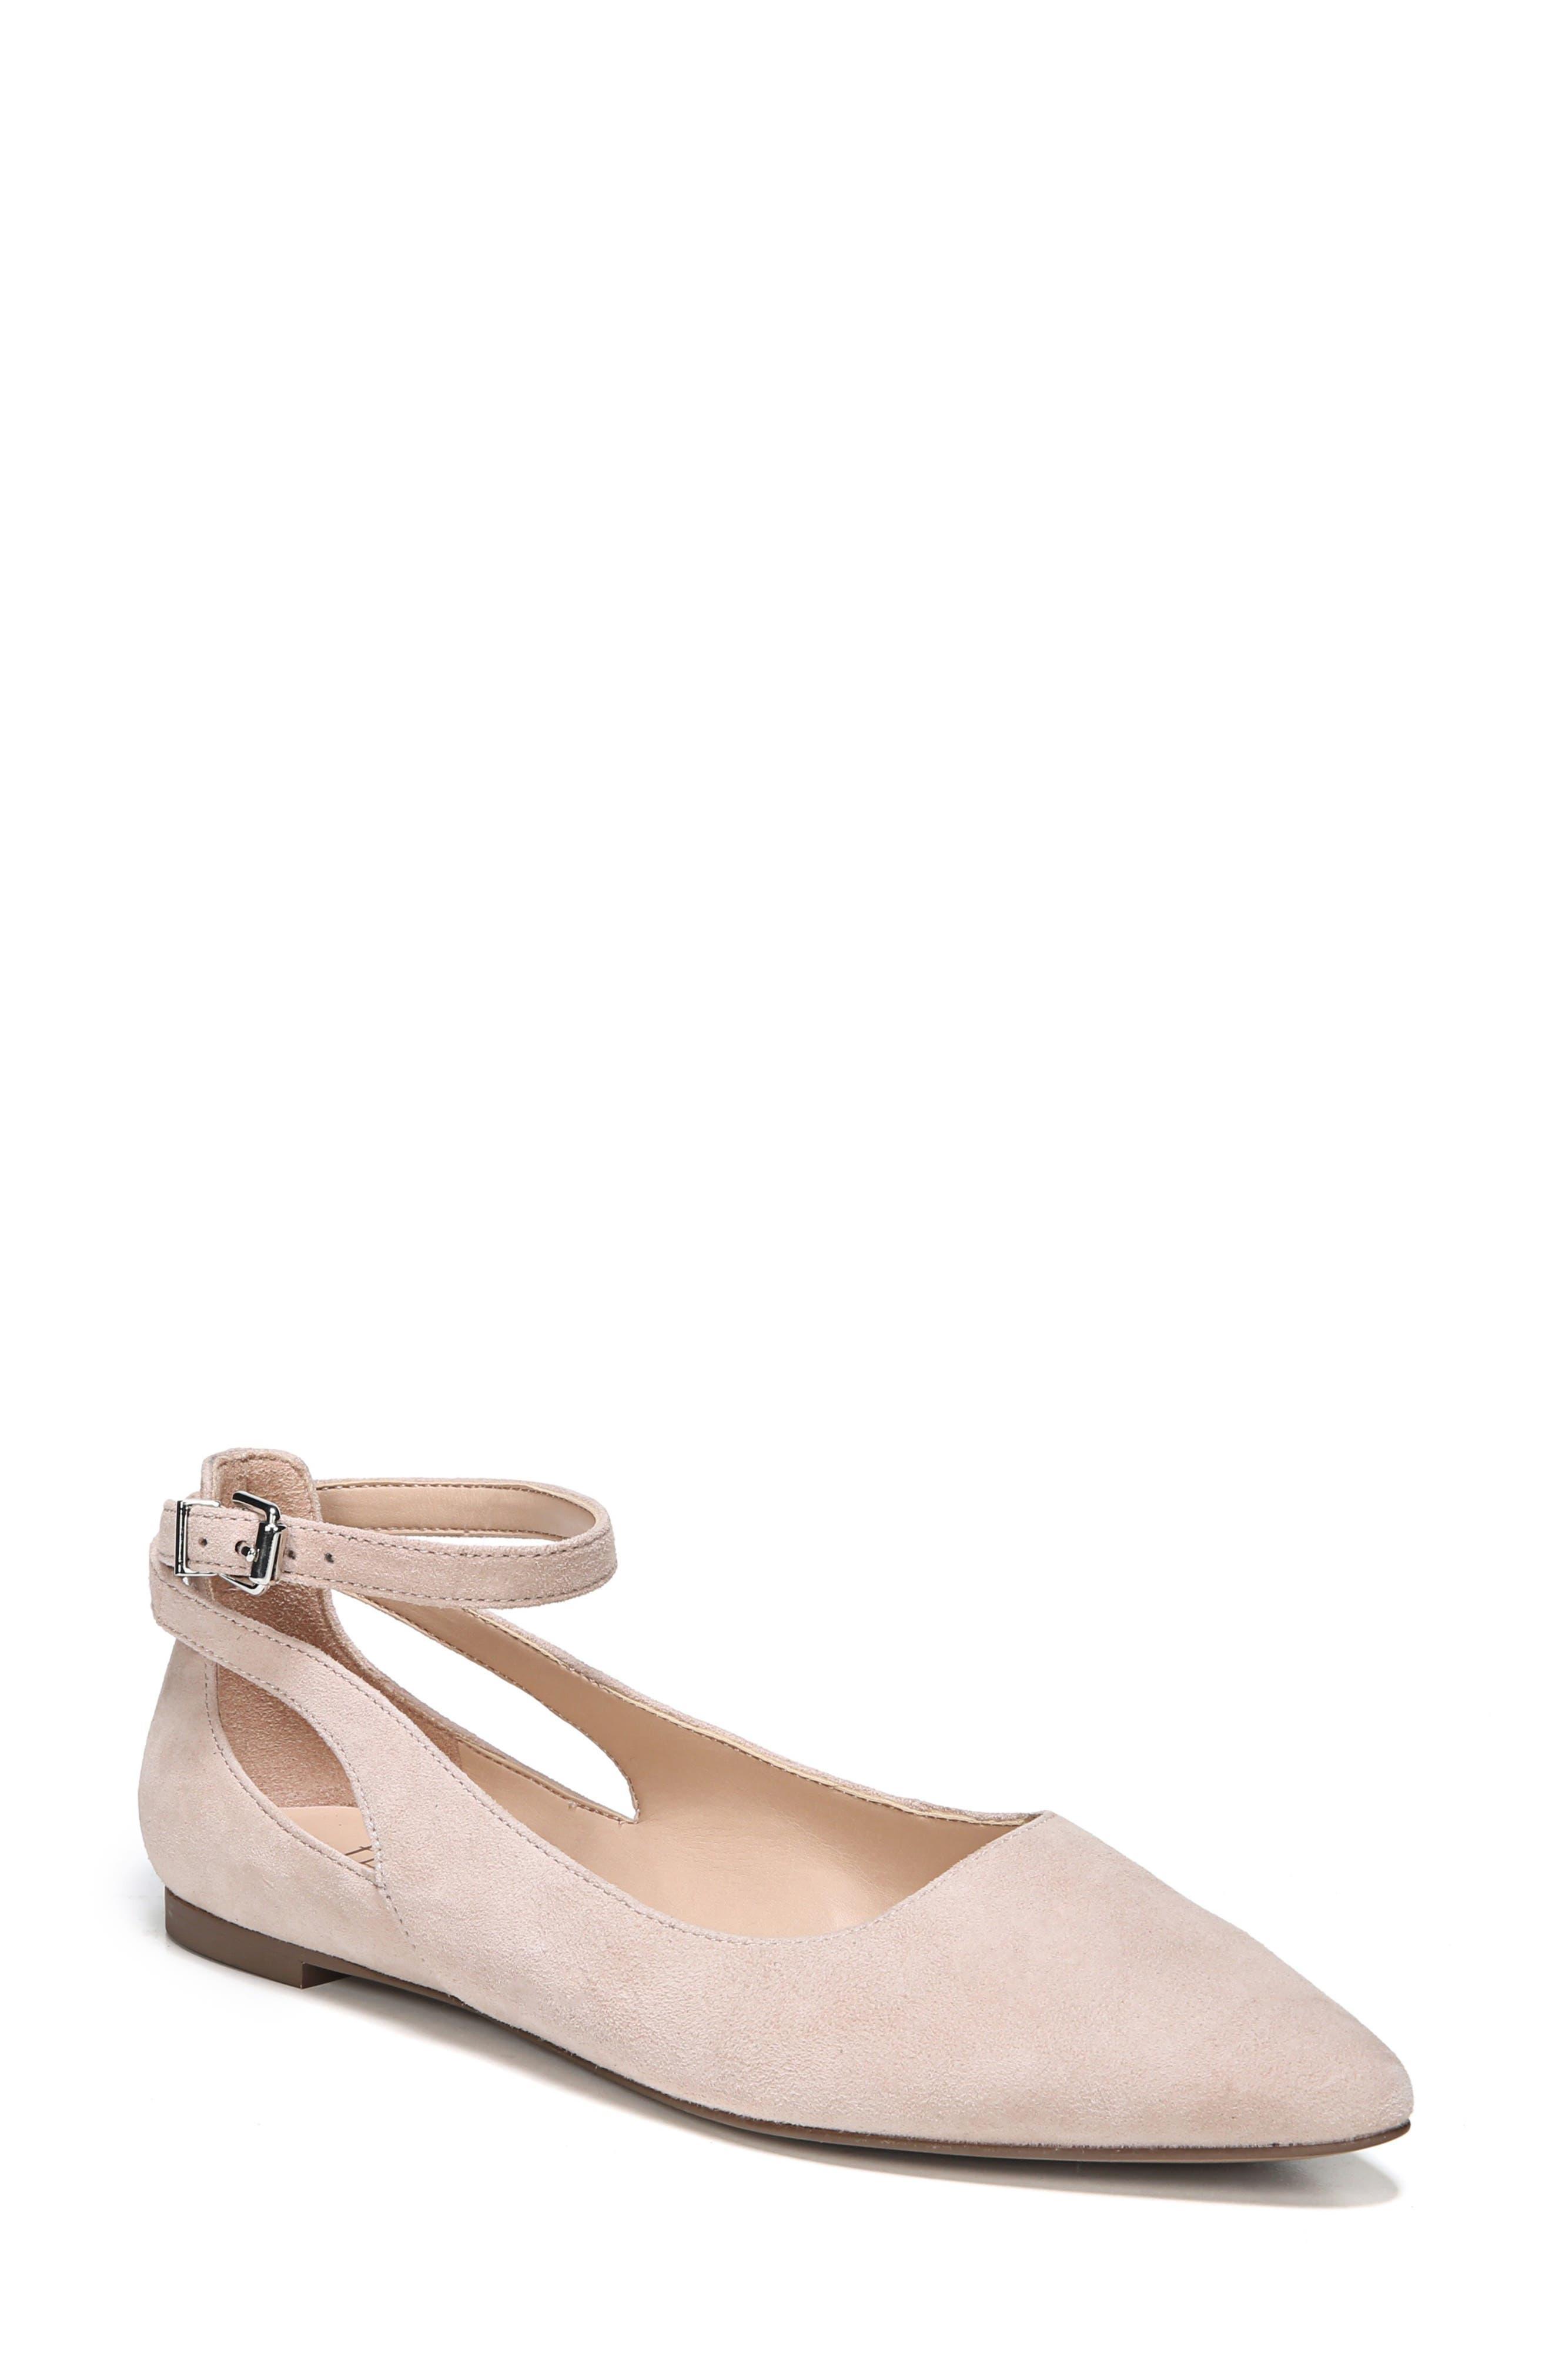 SARTO BY FRANCO SARTO Sylvia Ankle Strap Flat